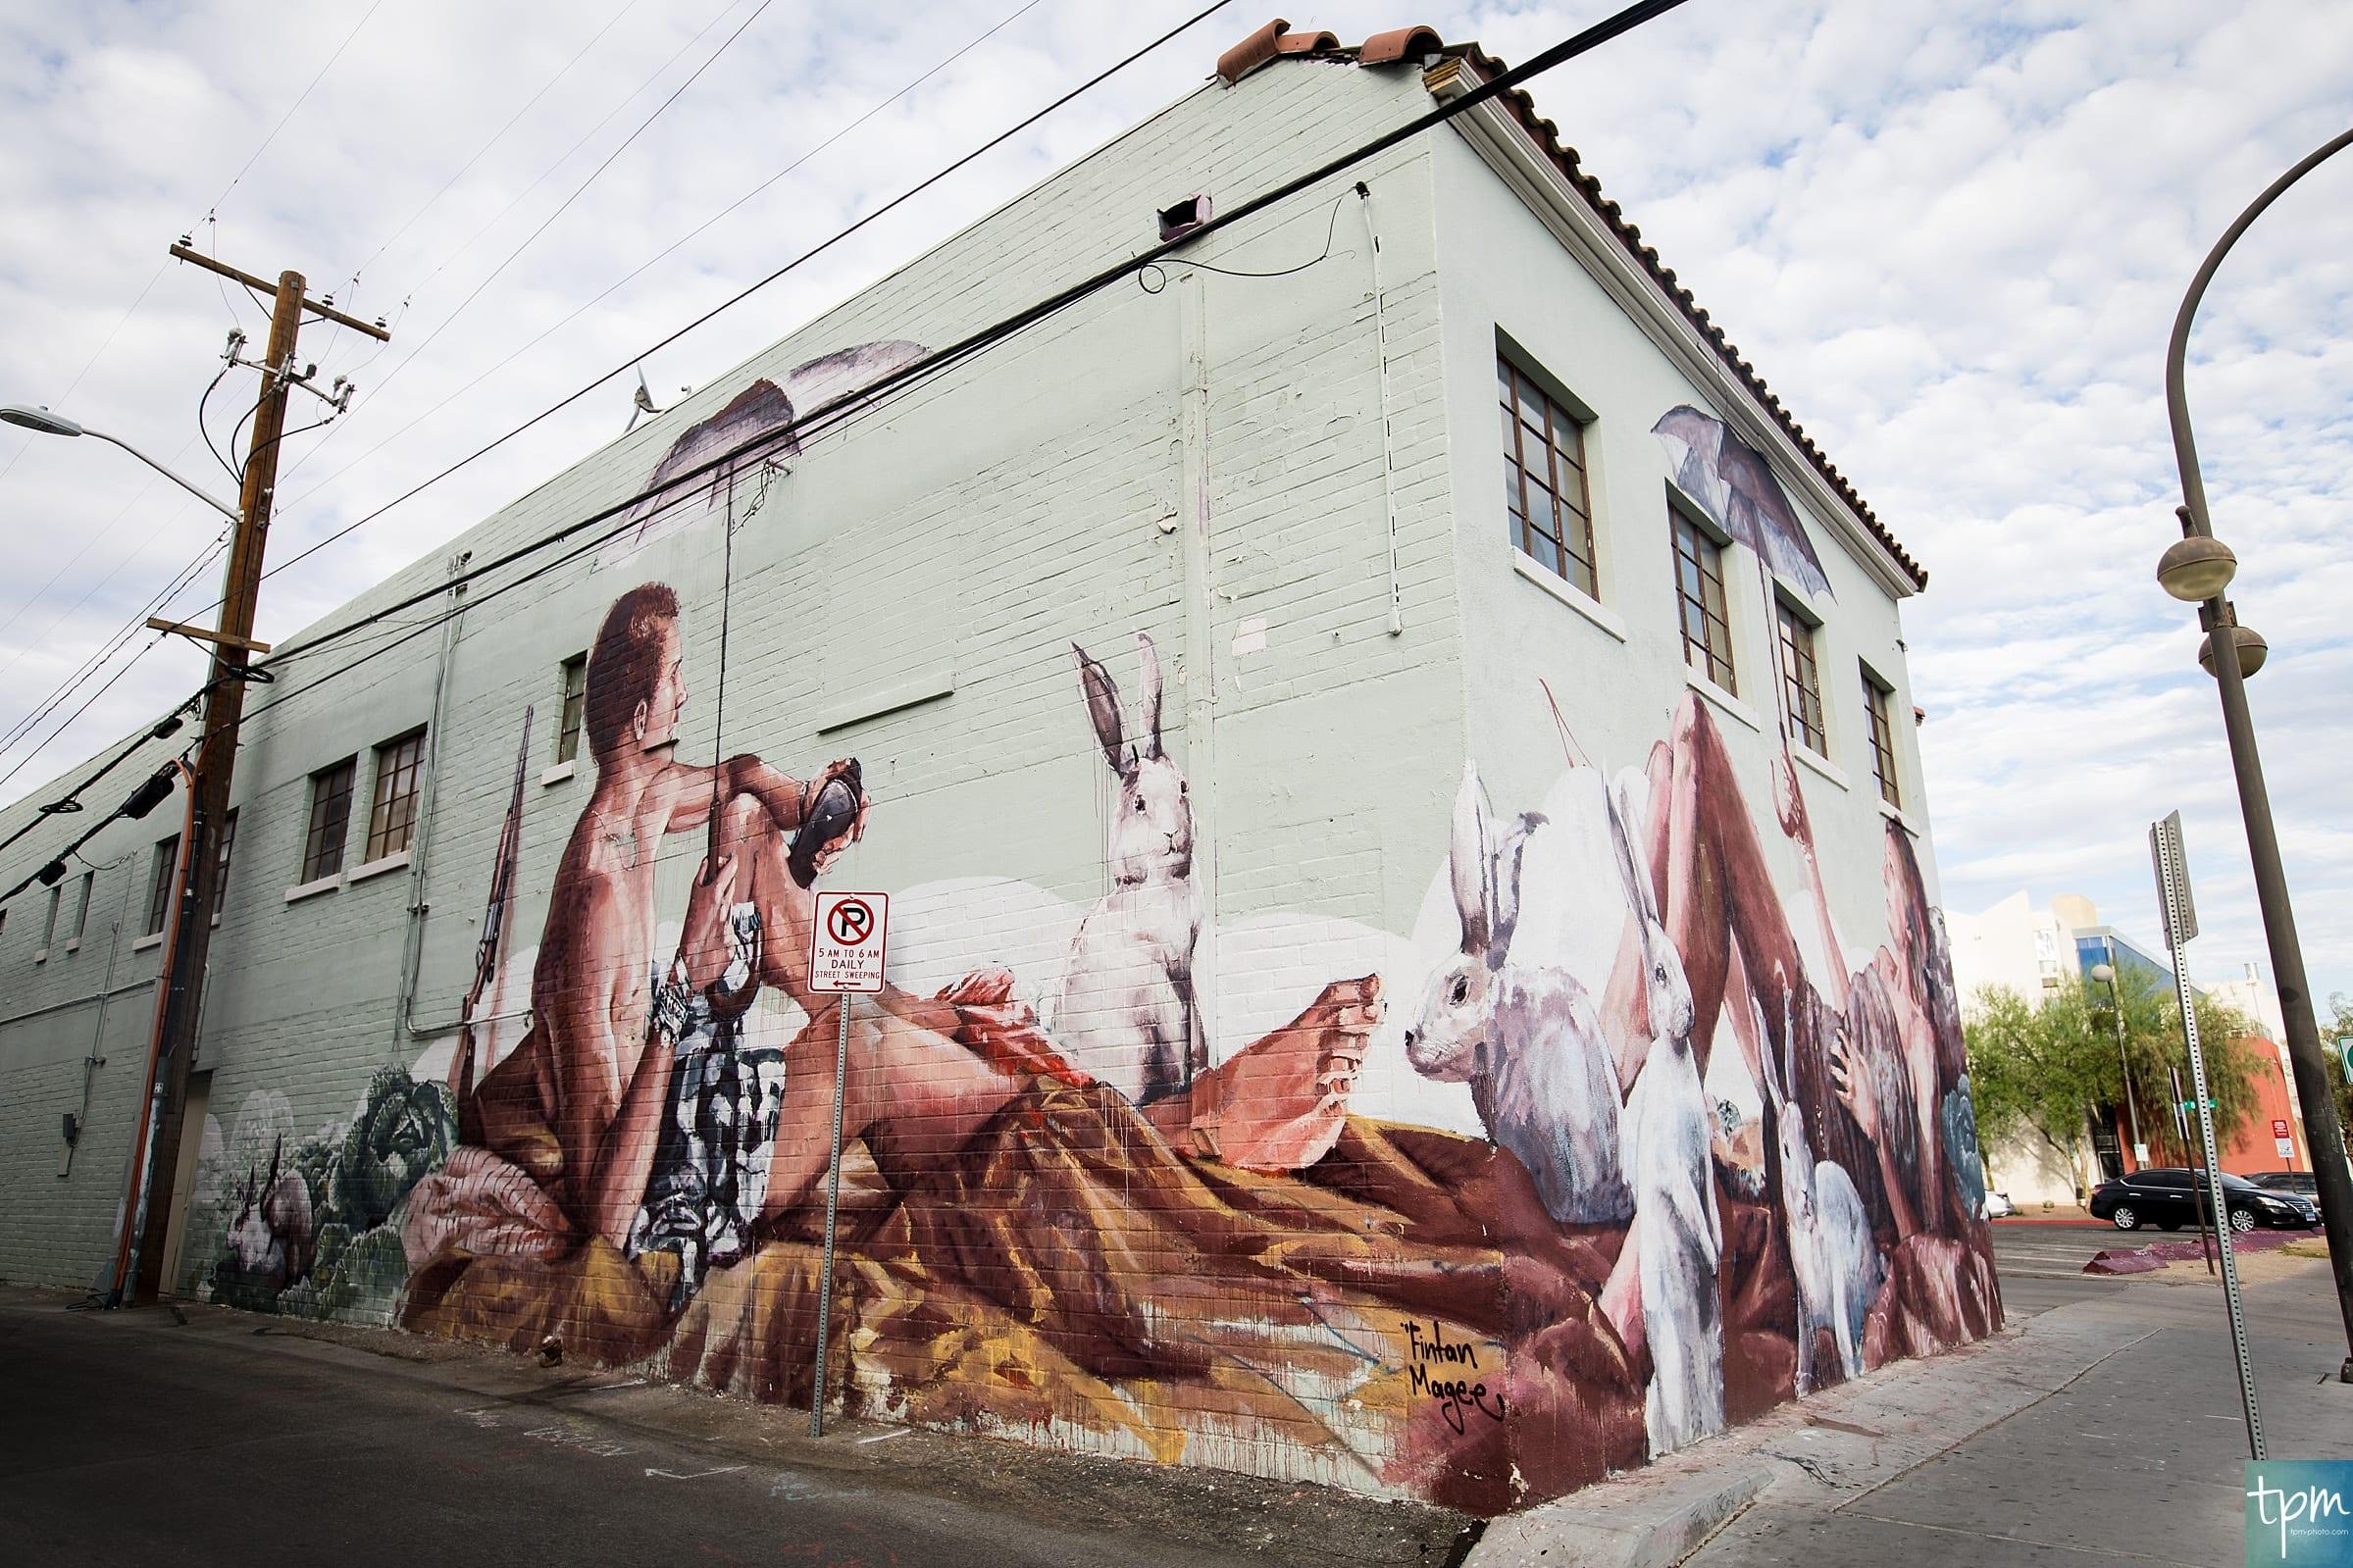 Fintan Magee, Ogden Ave, Taylored Photo Memories, Las Vegas Murals